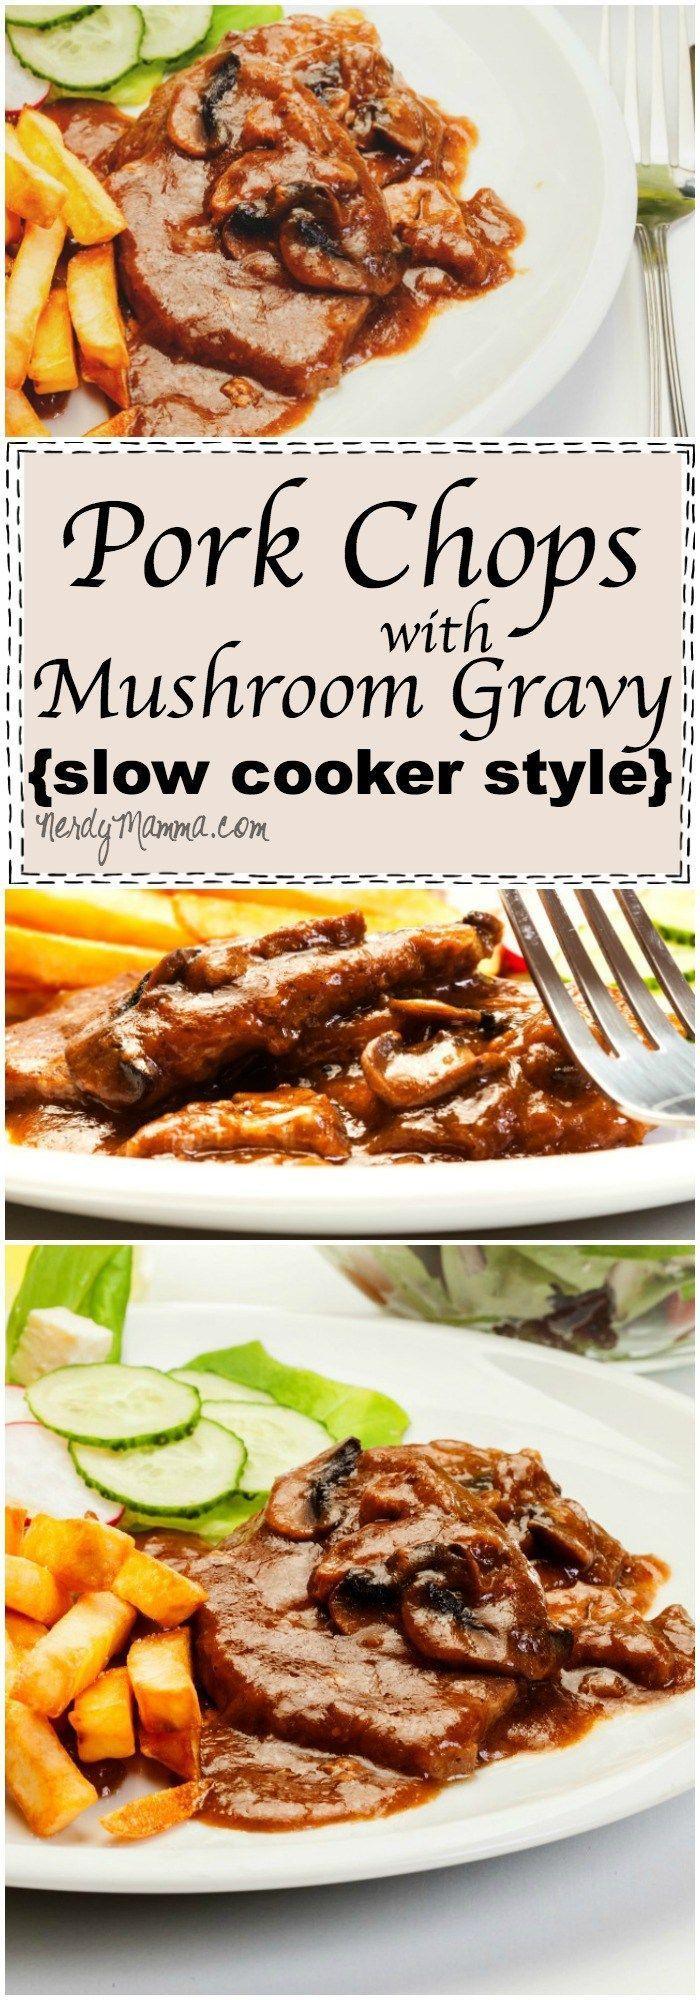 Pork Chops with Mushroom Gravy (Slow Cooker Style) | Recipe | Mushroom ...